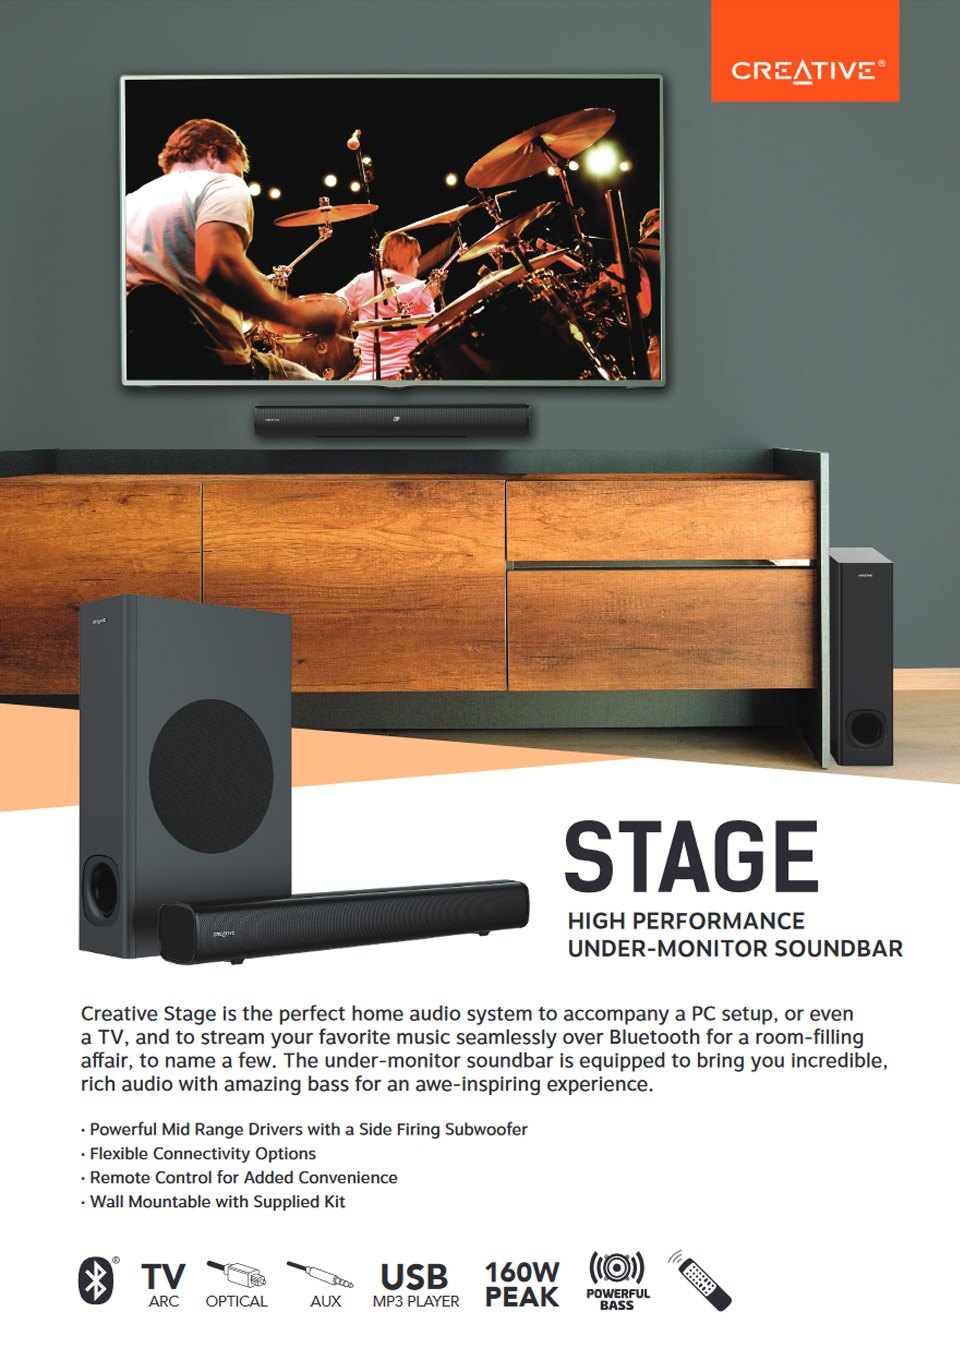 Creative Stage 2.1 Under Monitor Soundbar features